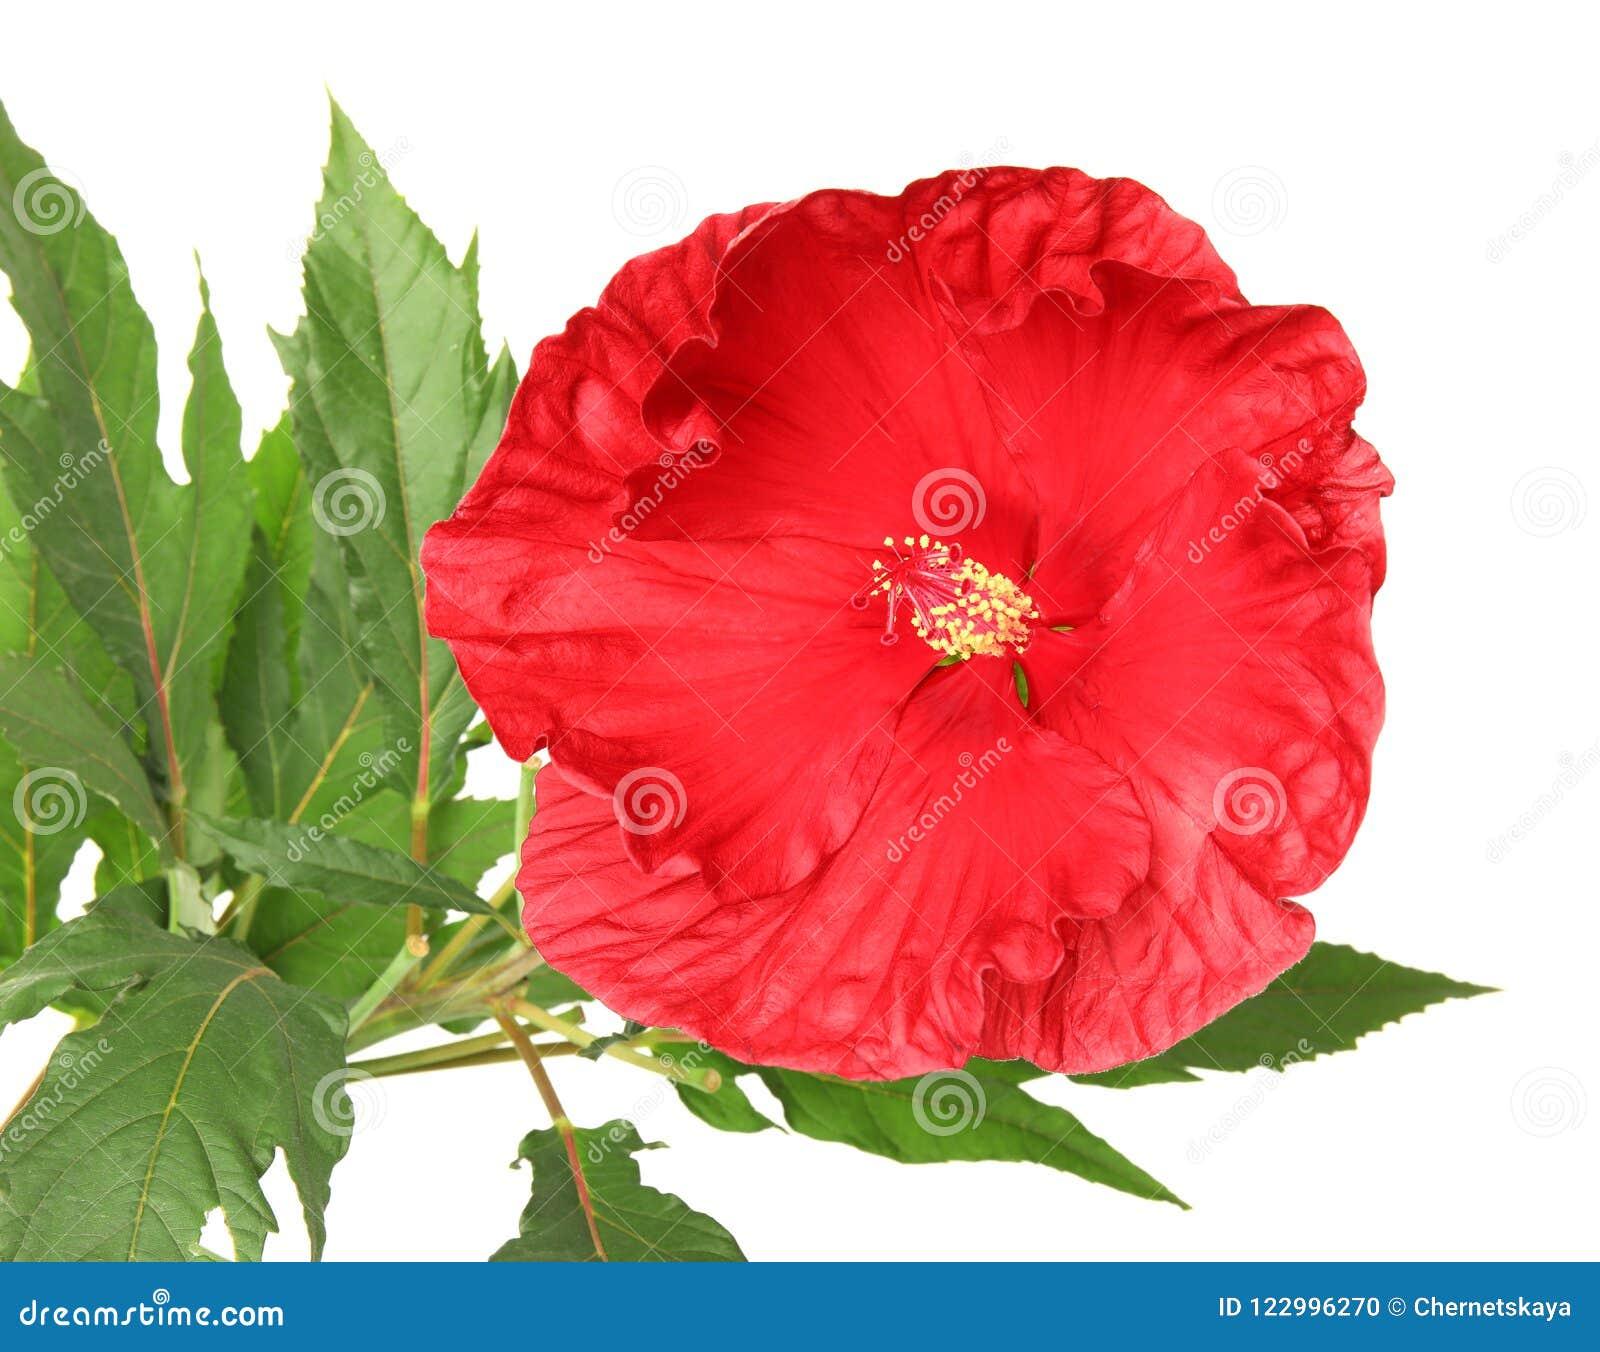 Beautiful red hibiscus flower stock photo image of chinese green download beautiful red hibiscus flower stock photo image of chinese green 122996270 izmirmasajfo